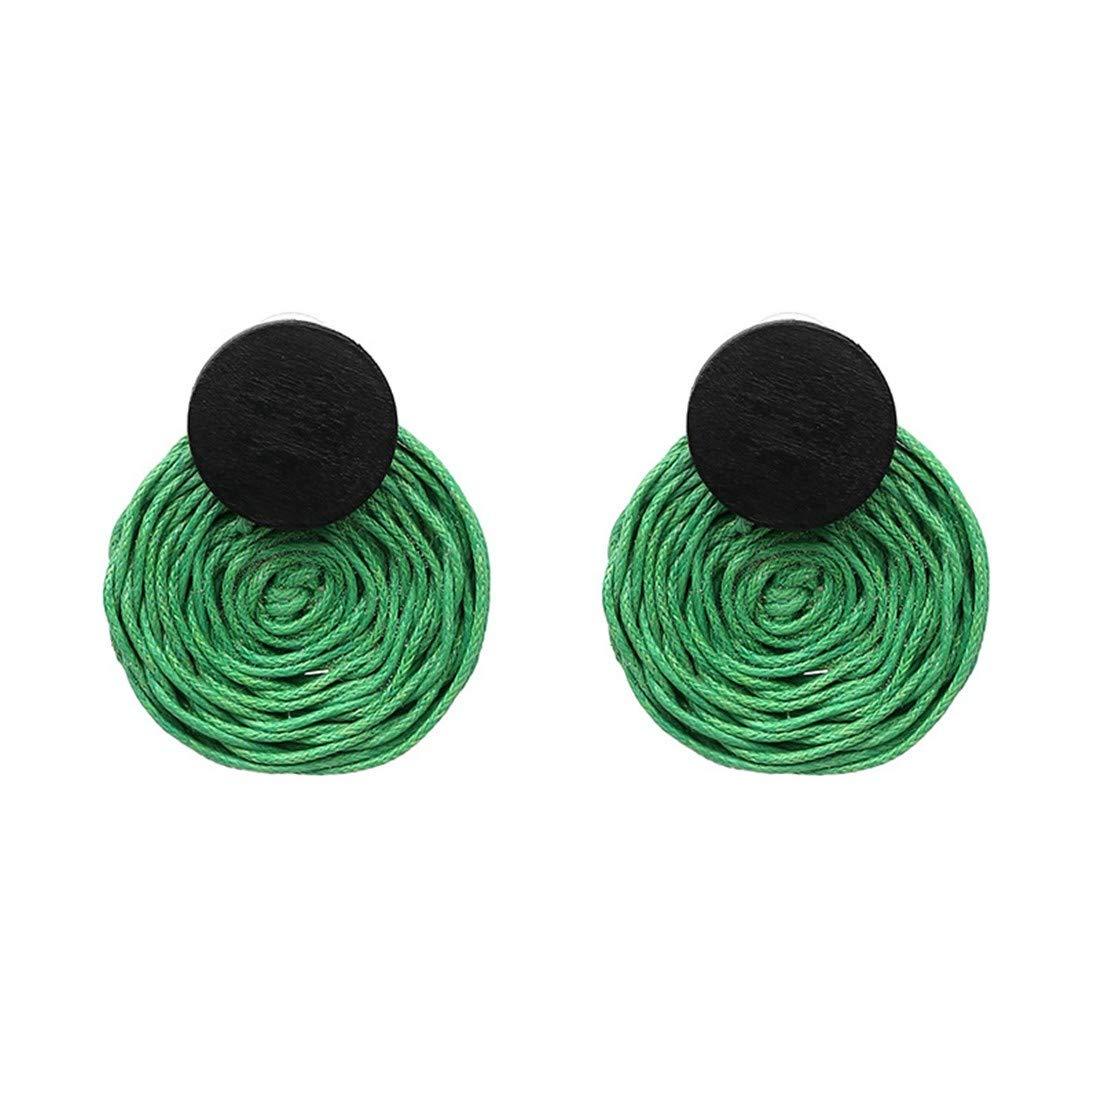 round wood stud earrings. hemp thread ball earrings|clip on earrings|ear cuffs|dangle earrings|earring jackets|hoop earrings|stud earrings|Lovely ear studs